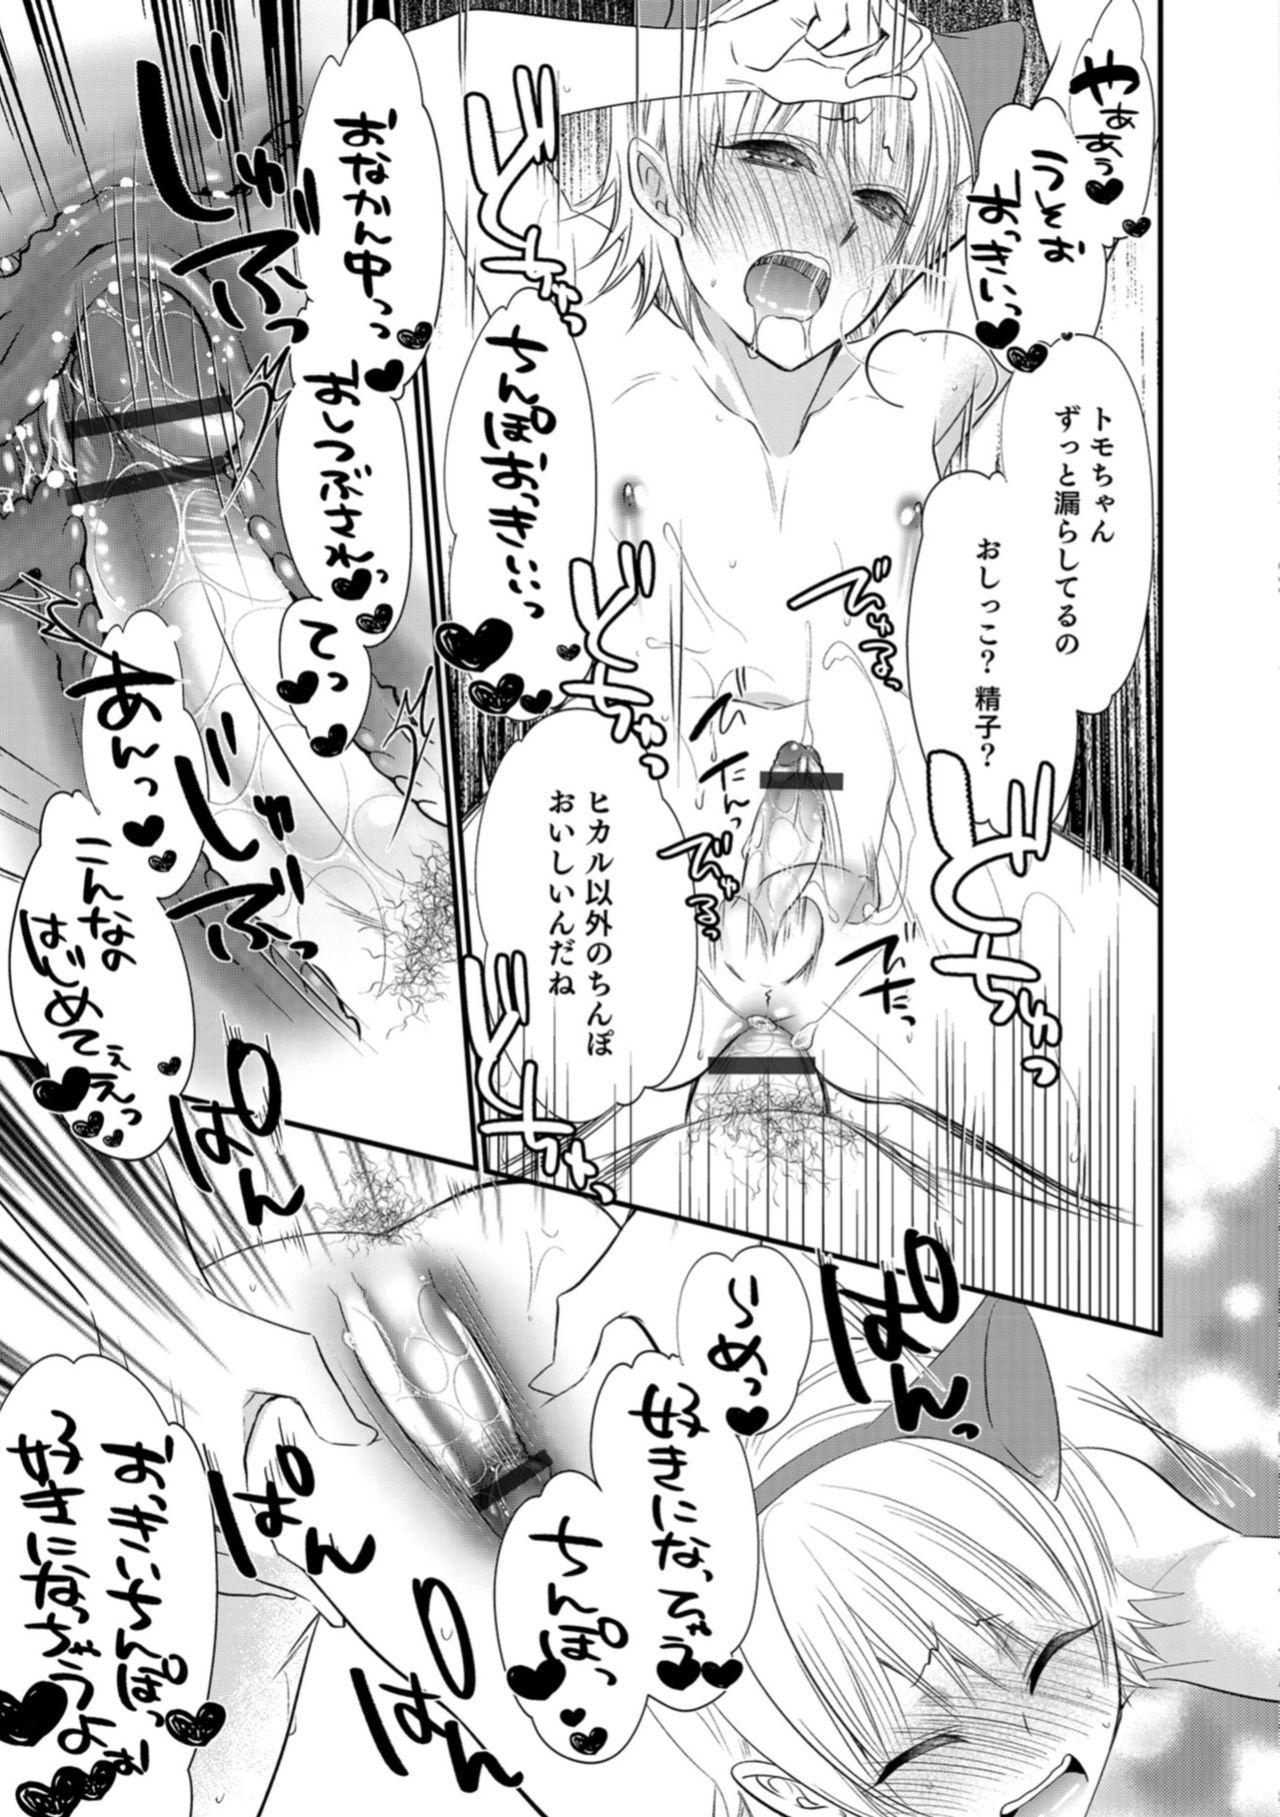 Otokonoko HELL'S GATE #03 114